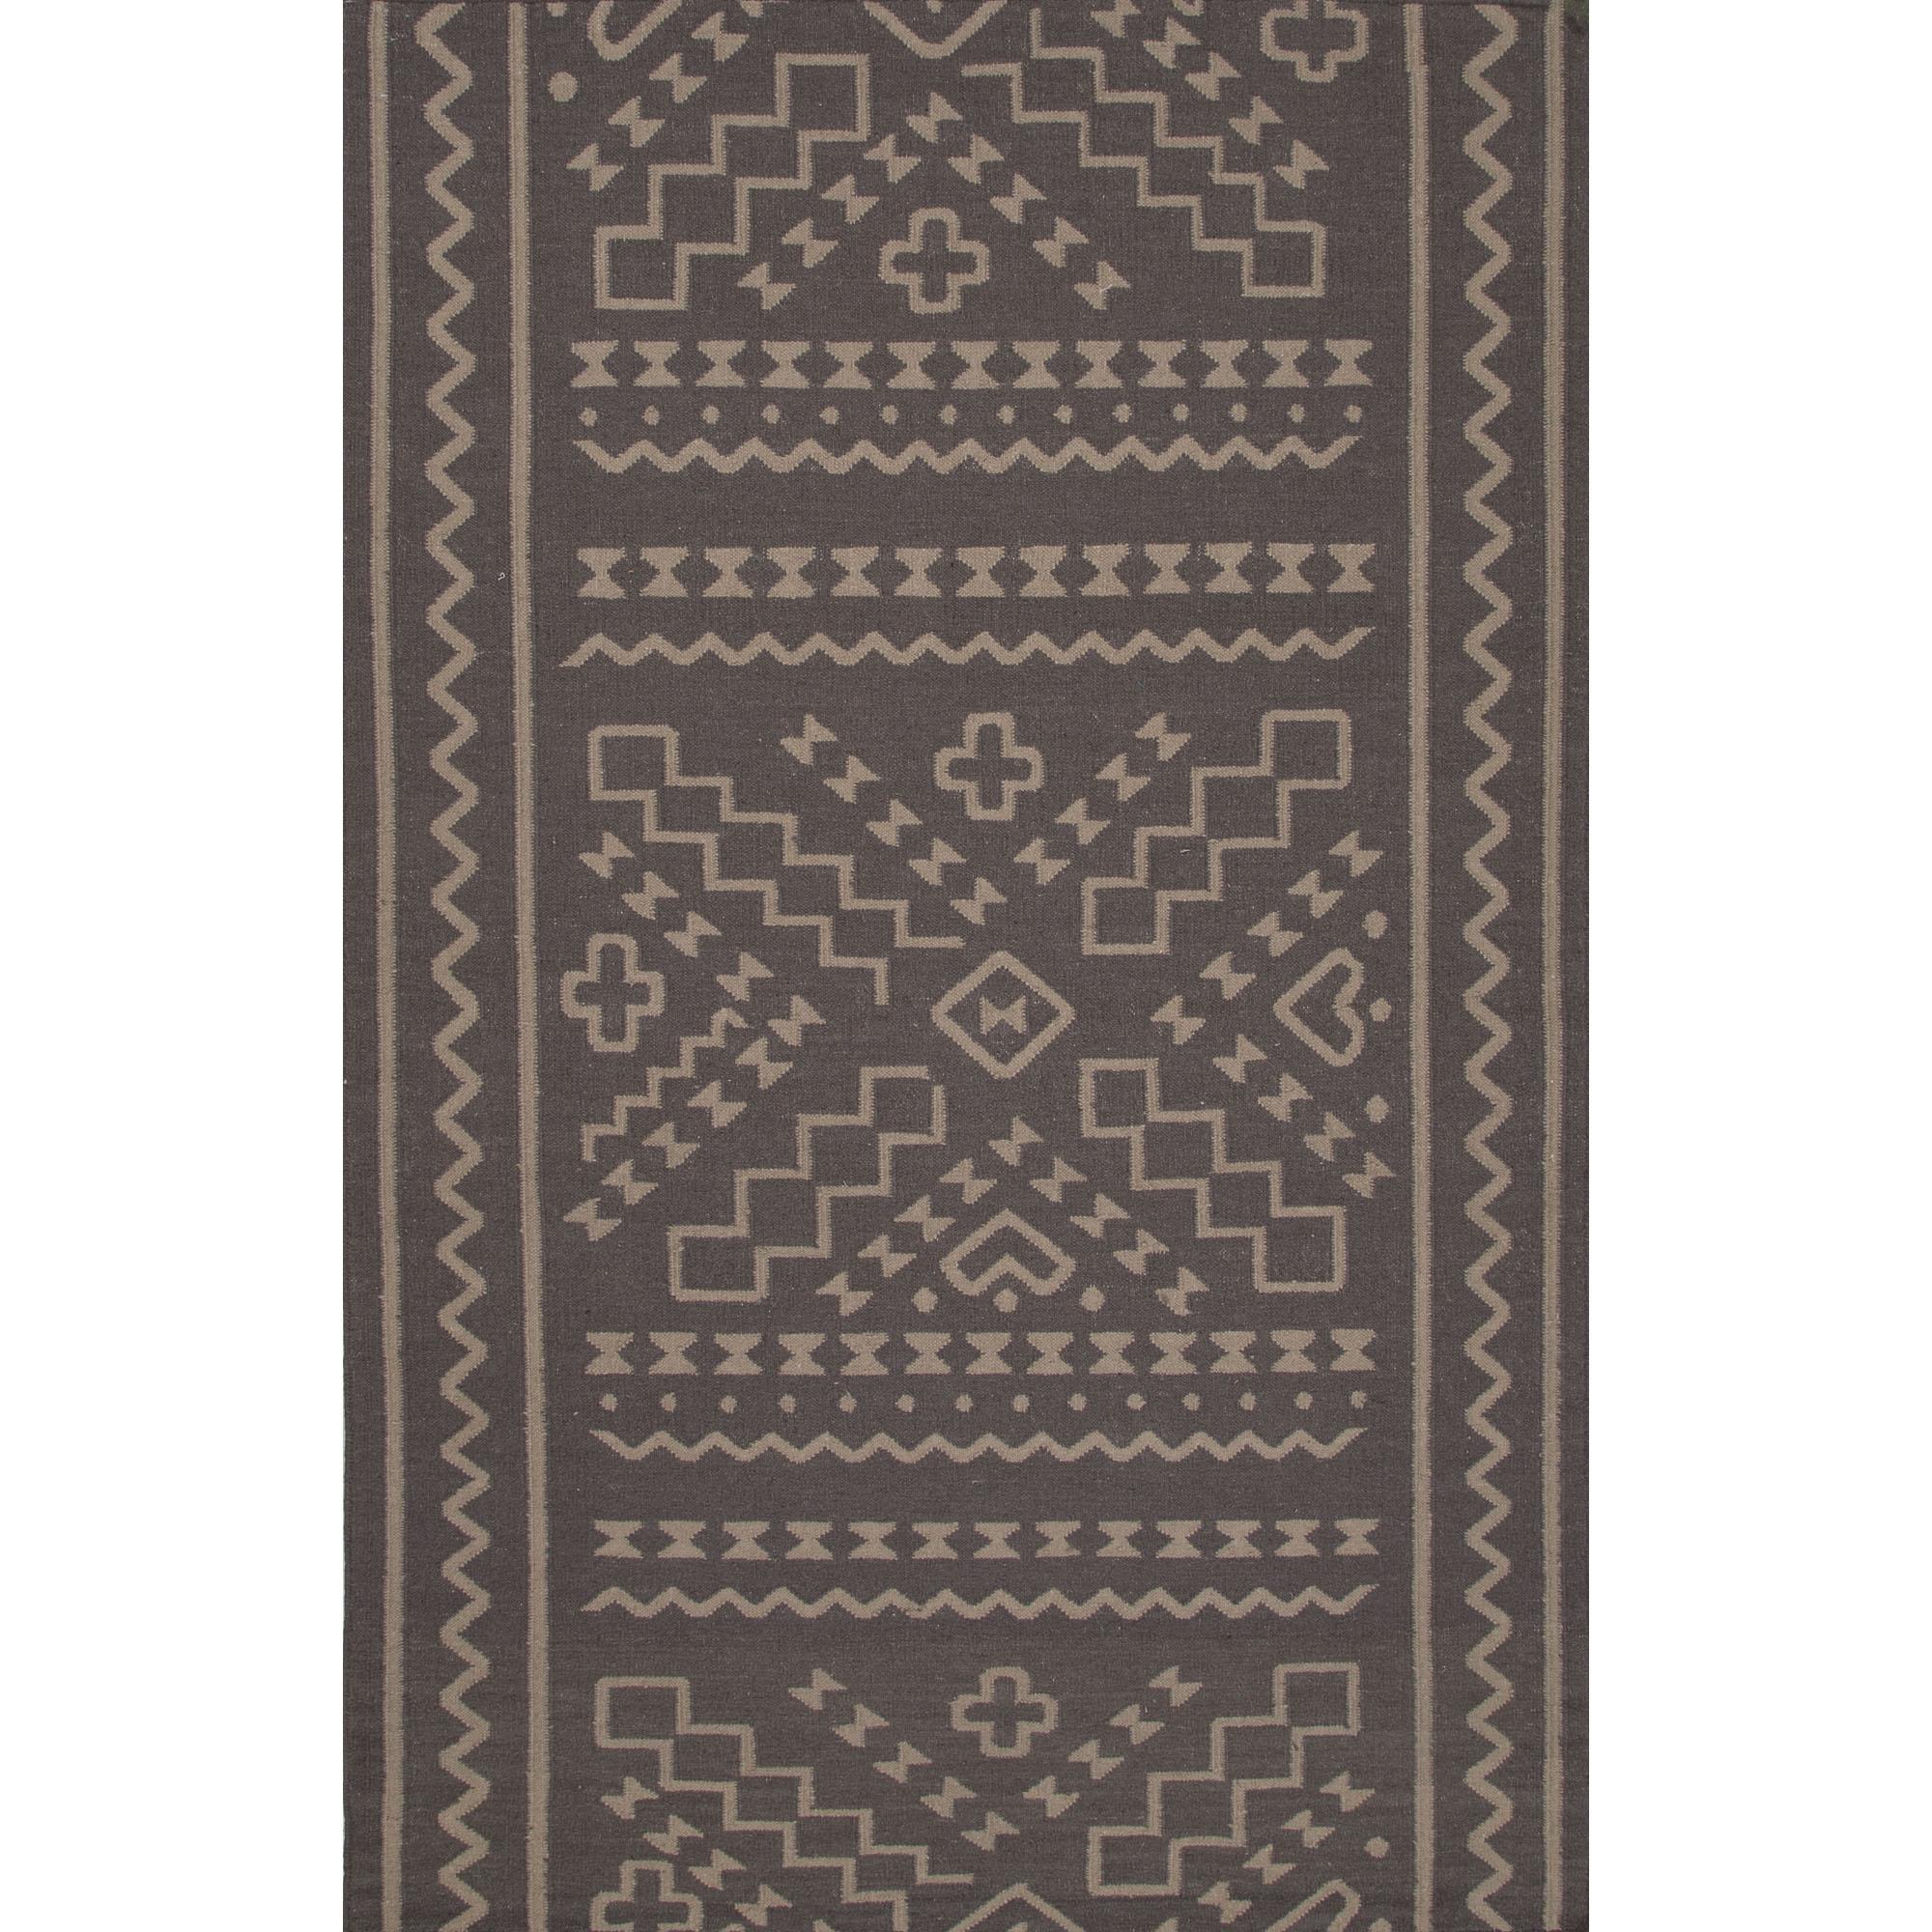 JAIPUR Rugs Traditions Modern Flat Weave 8 x 11 Rug - Item Number: RUG122247